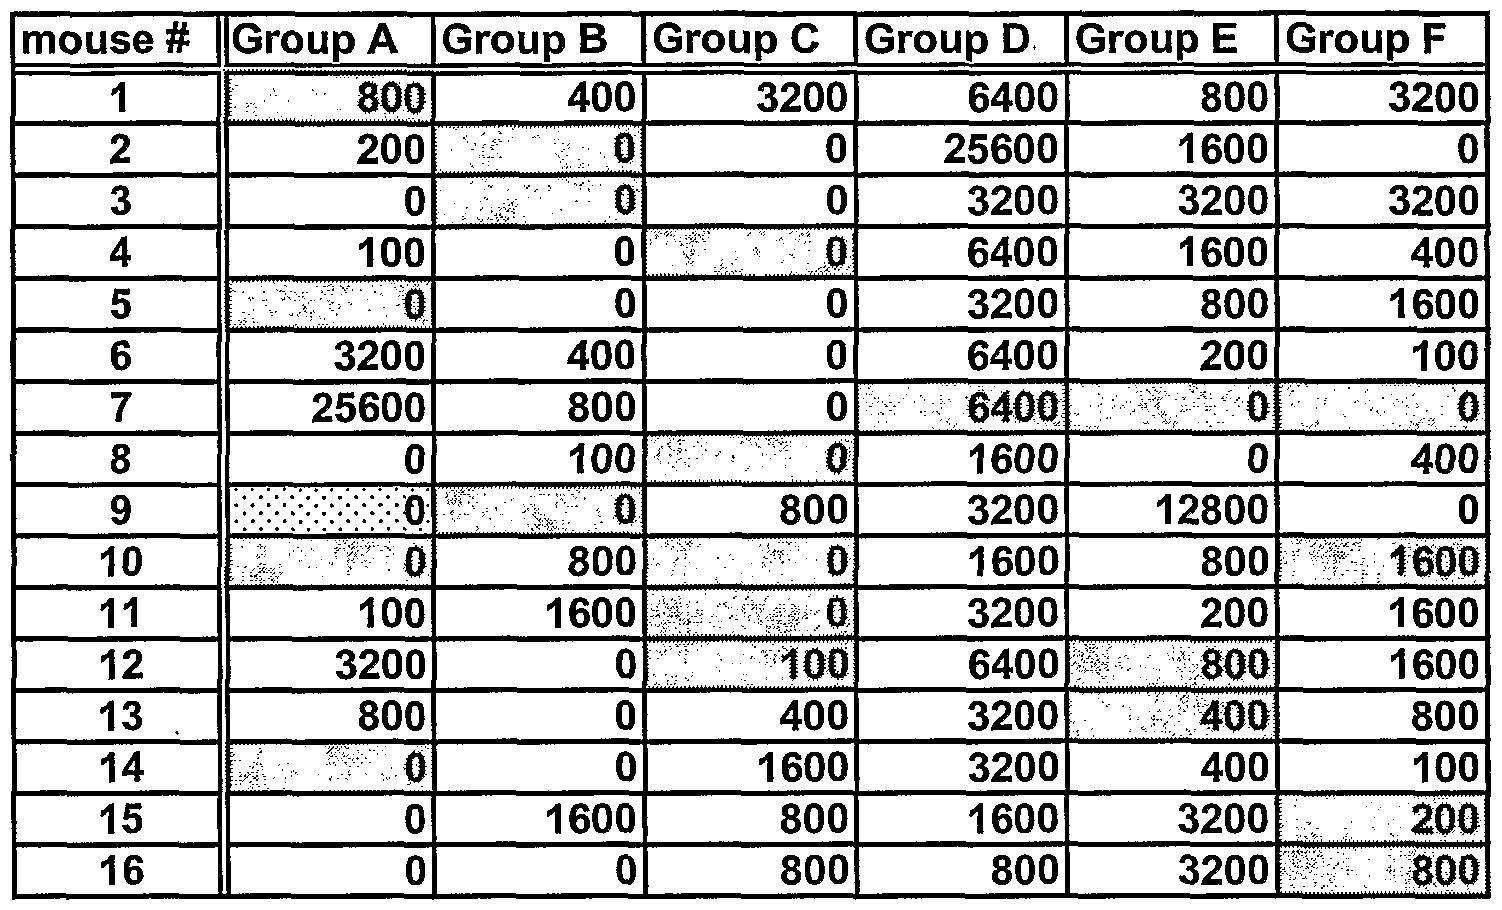 Wo2005116270A2 - Influenza Virus Vaccine Composition And Inside Gcu Academic Calendar 2021 20